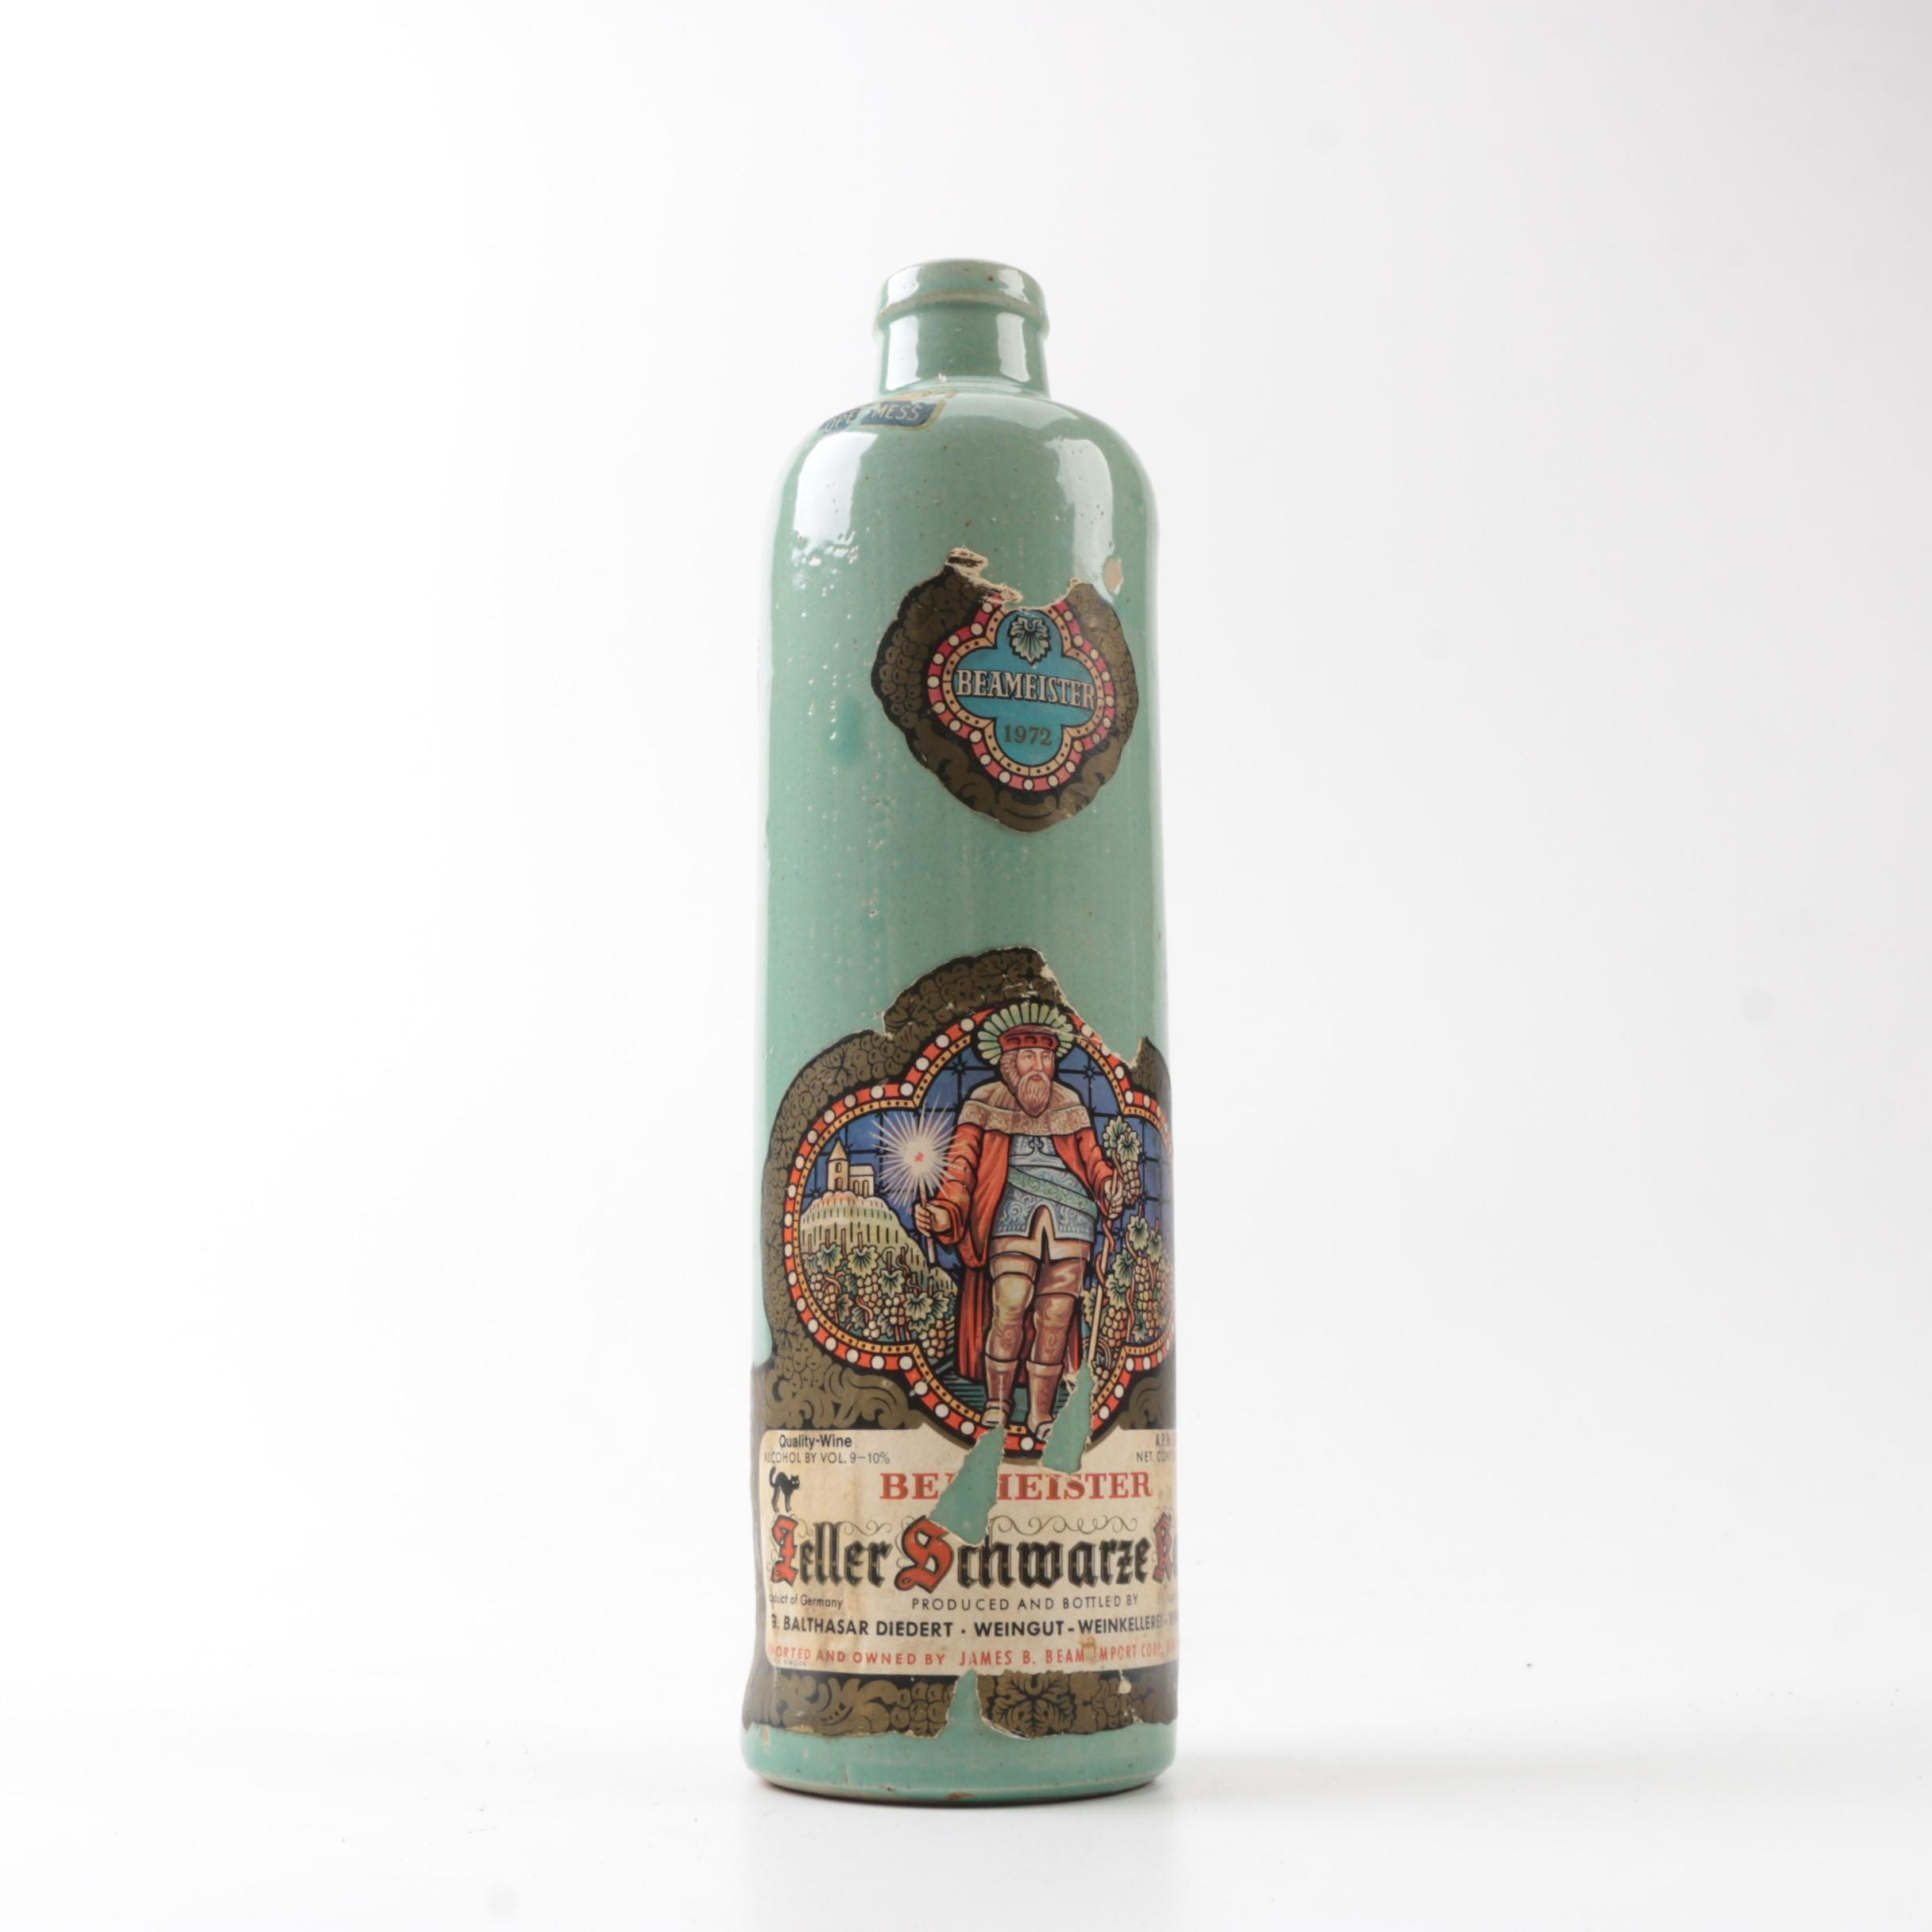 1972 Beameister Zeller Schwarze Katz Stoneware Bottle